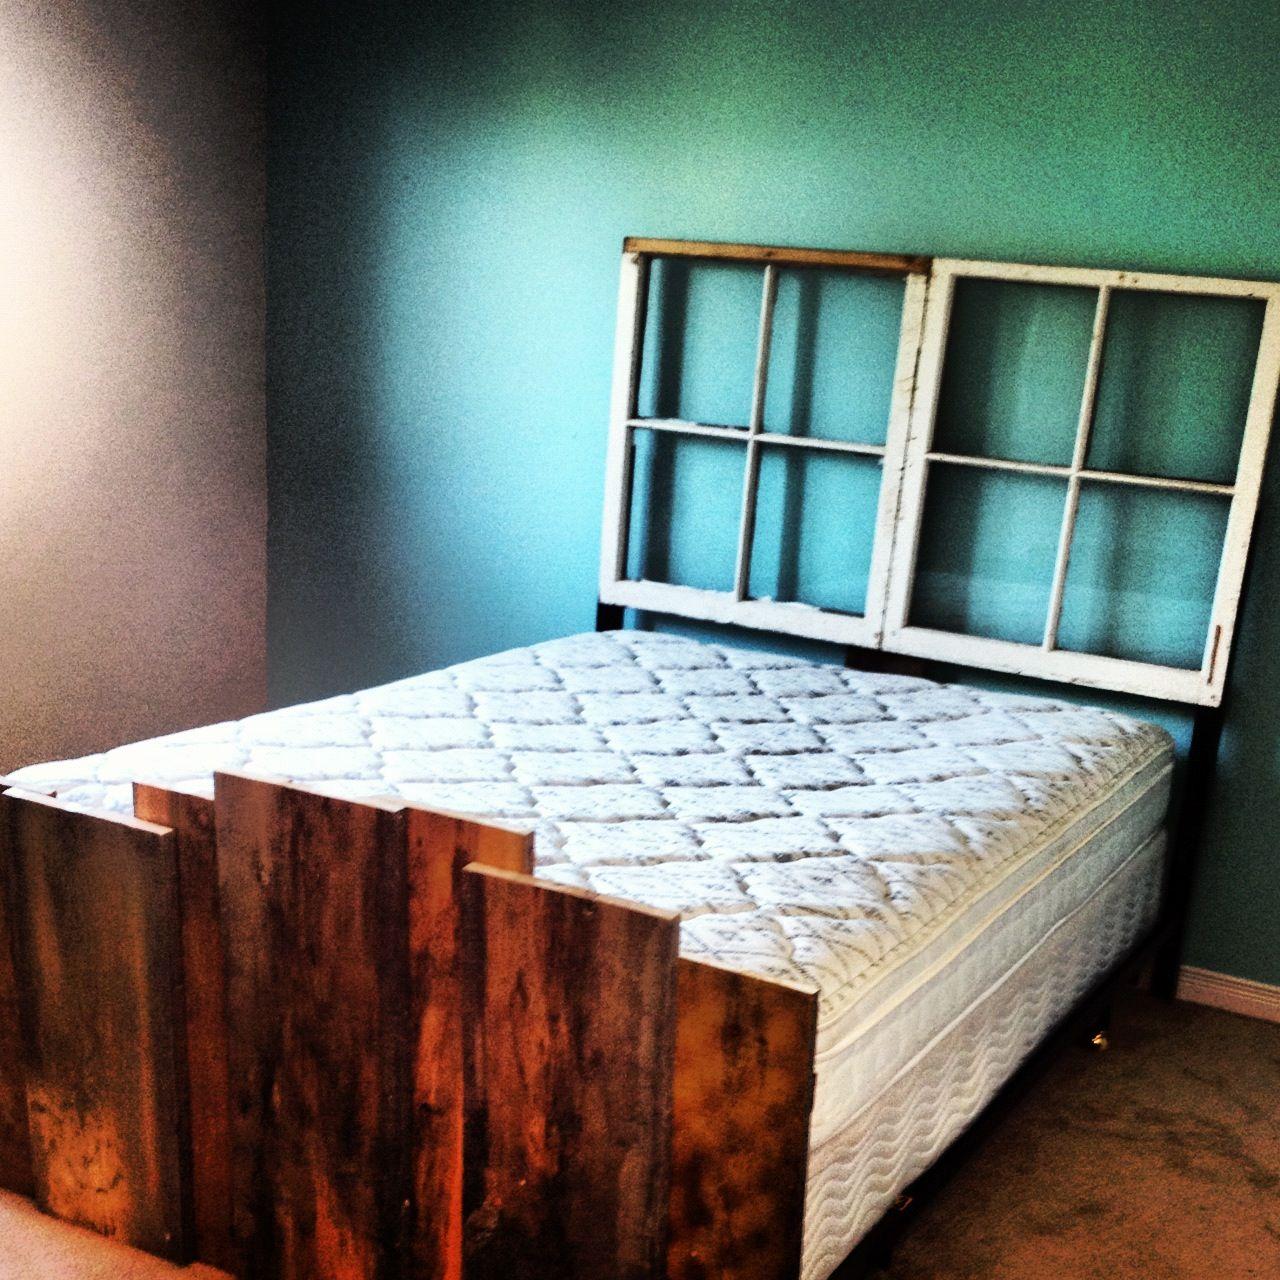 Diy bedroom headboard ideas diy head board and footboard maybe put shelves or cabinets in